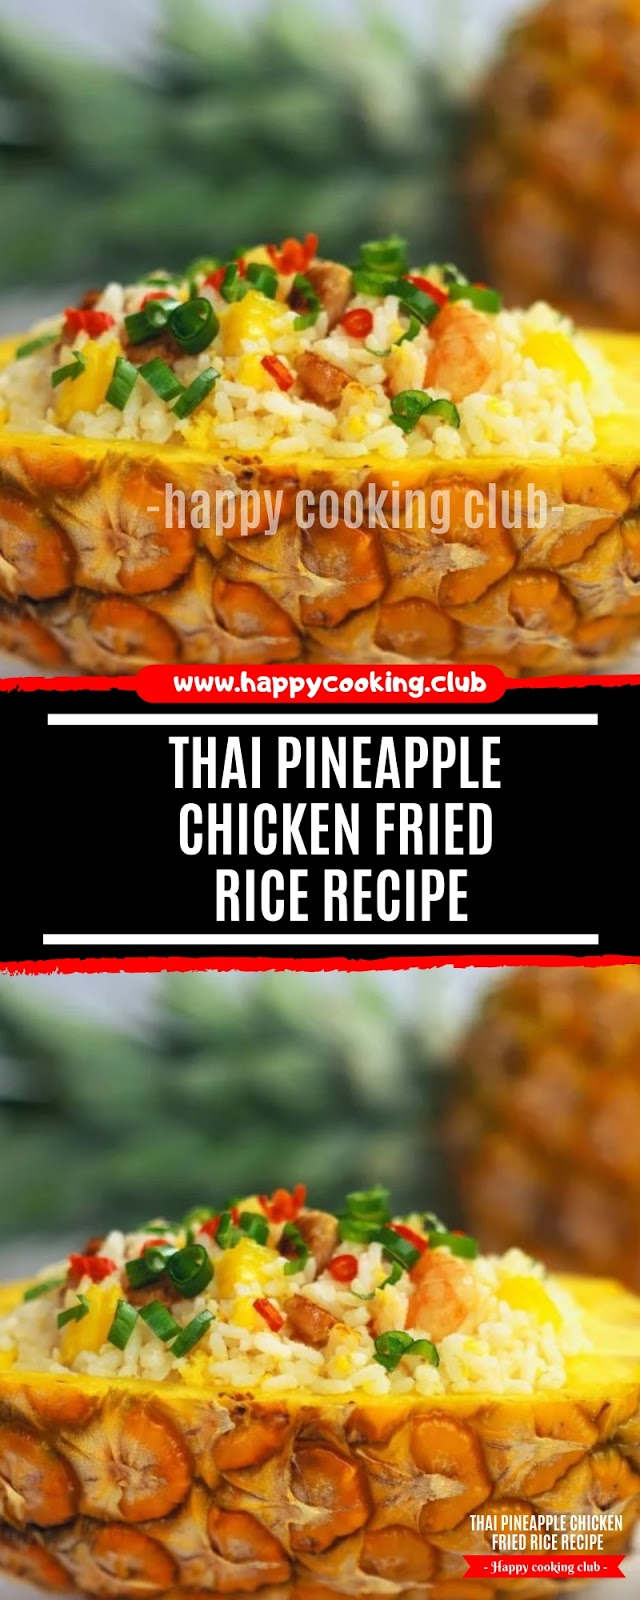 Thai Pineapple Chicken Fried Rice Recipe